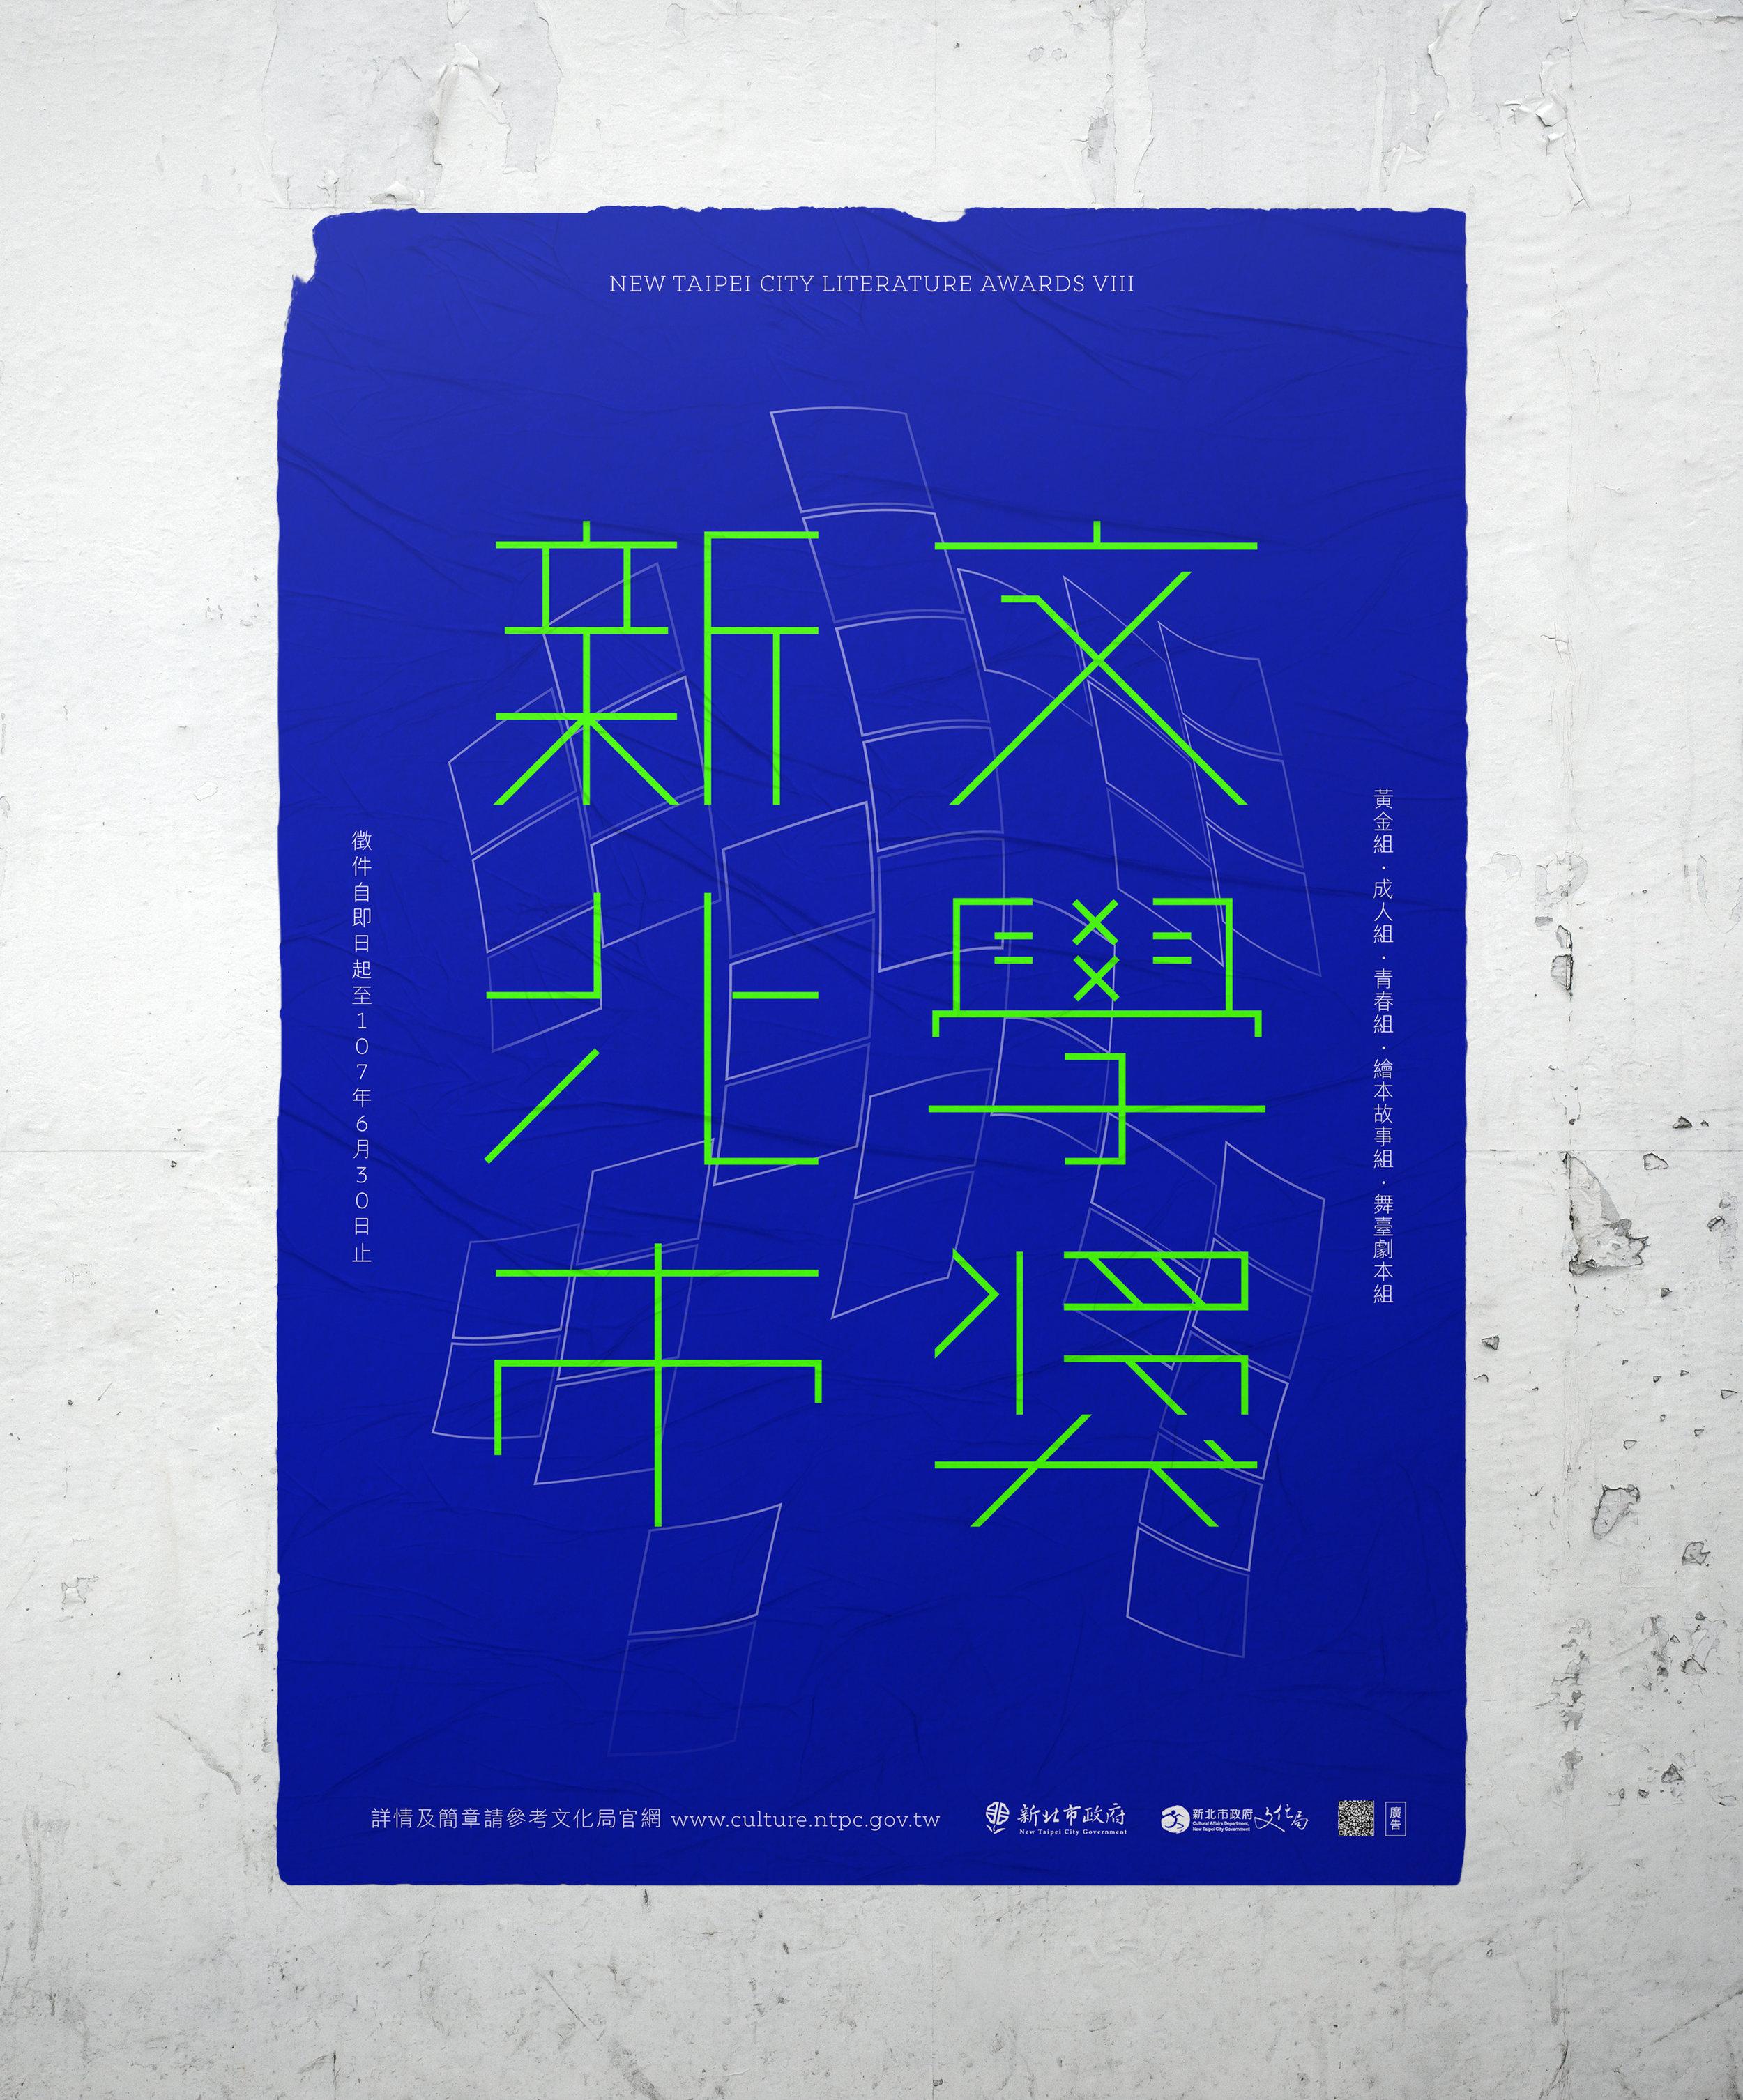 Mockup_Wheatpaste Poster.jpg